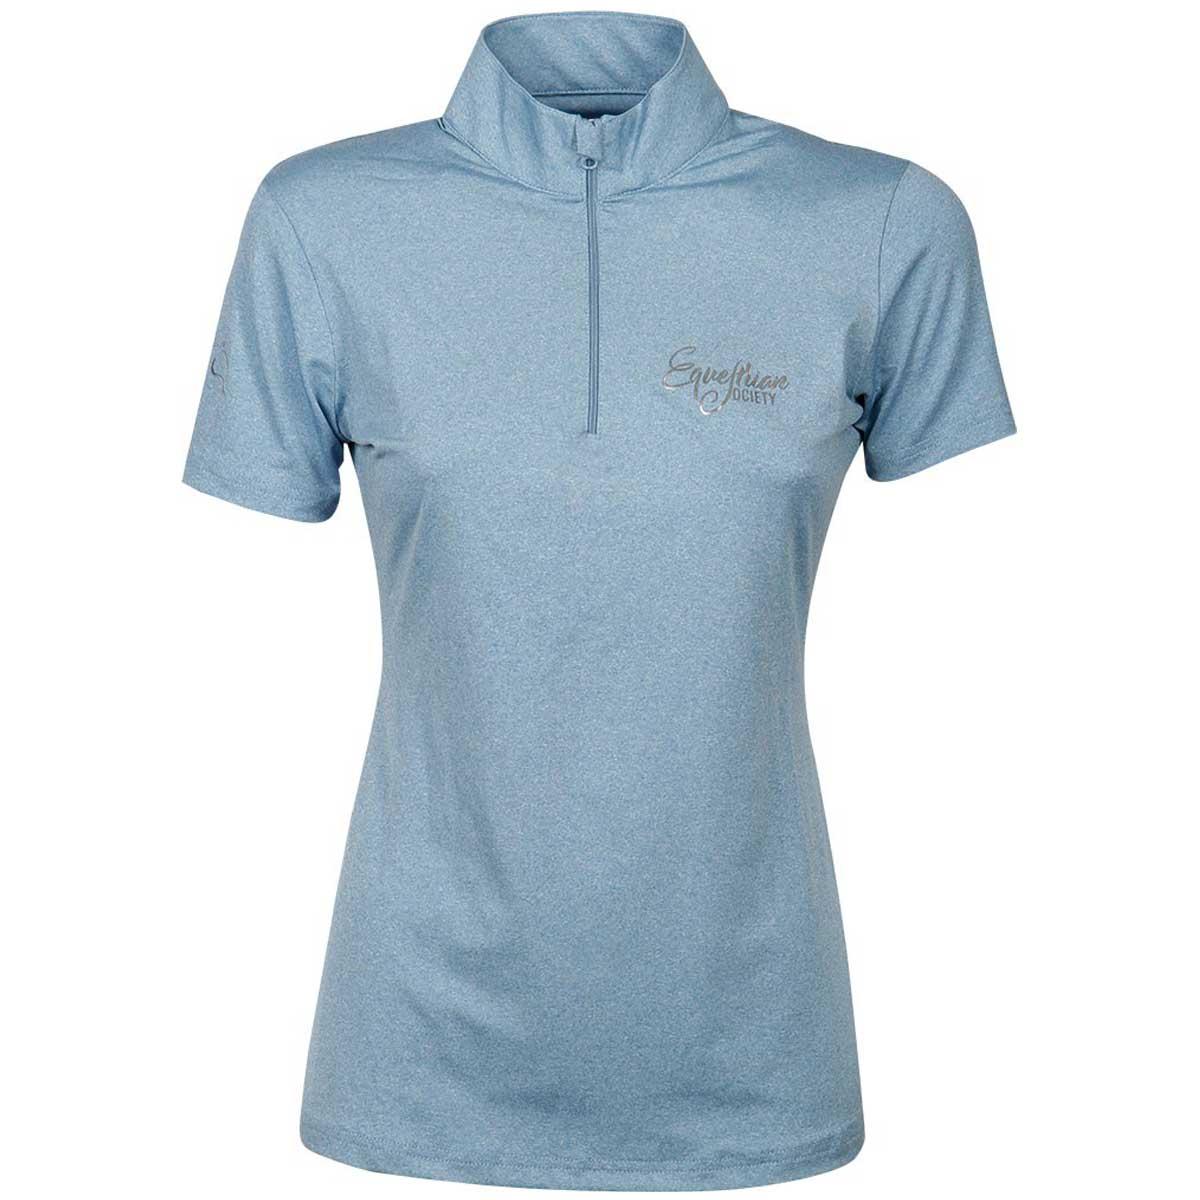 Harry's Horse Harding Techshirt lichtblauw maat:l